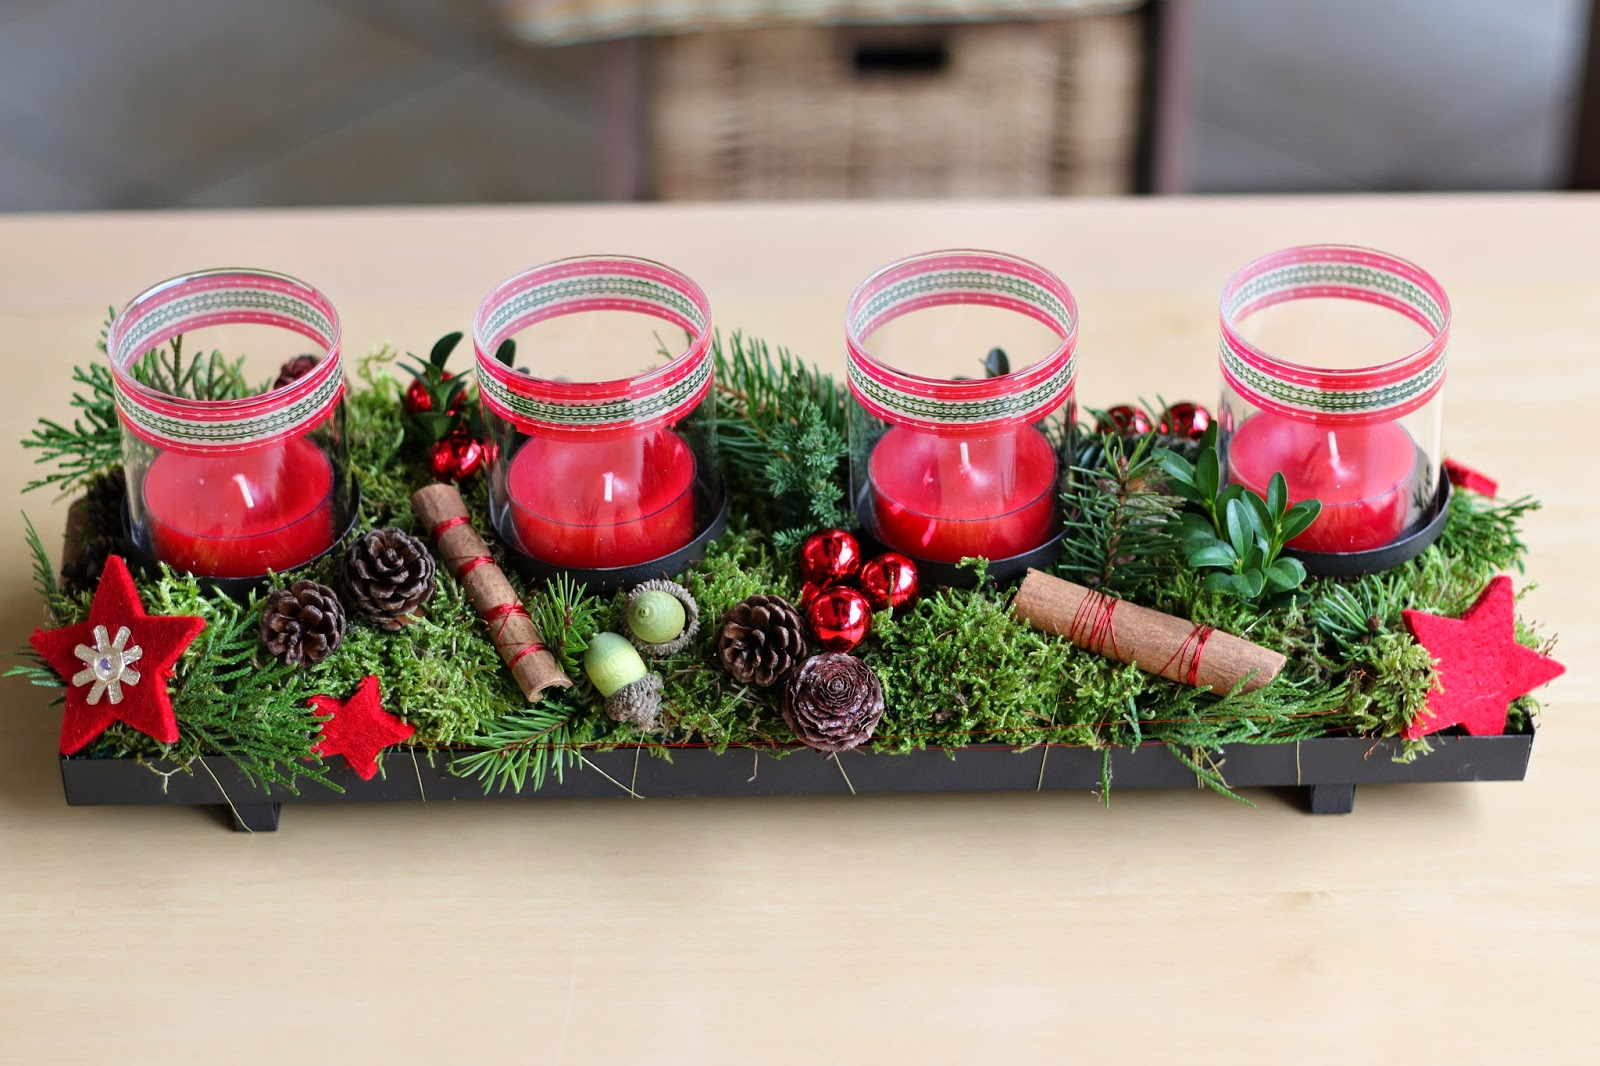 Handmade By Bettina: Adventsgesteck Für Den Klassenraum